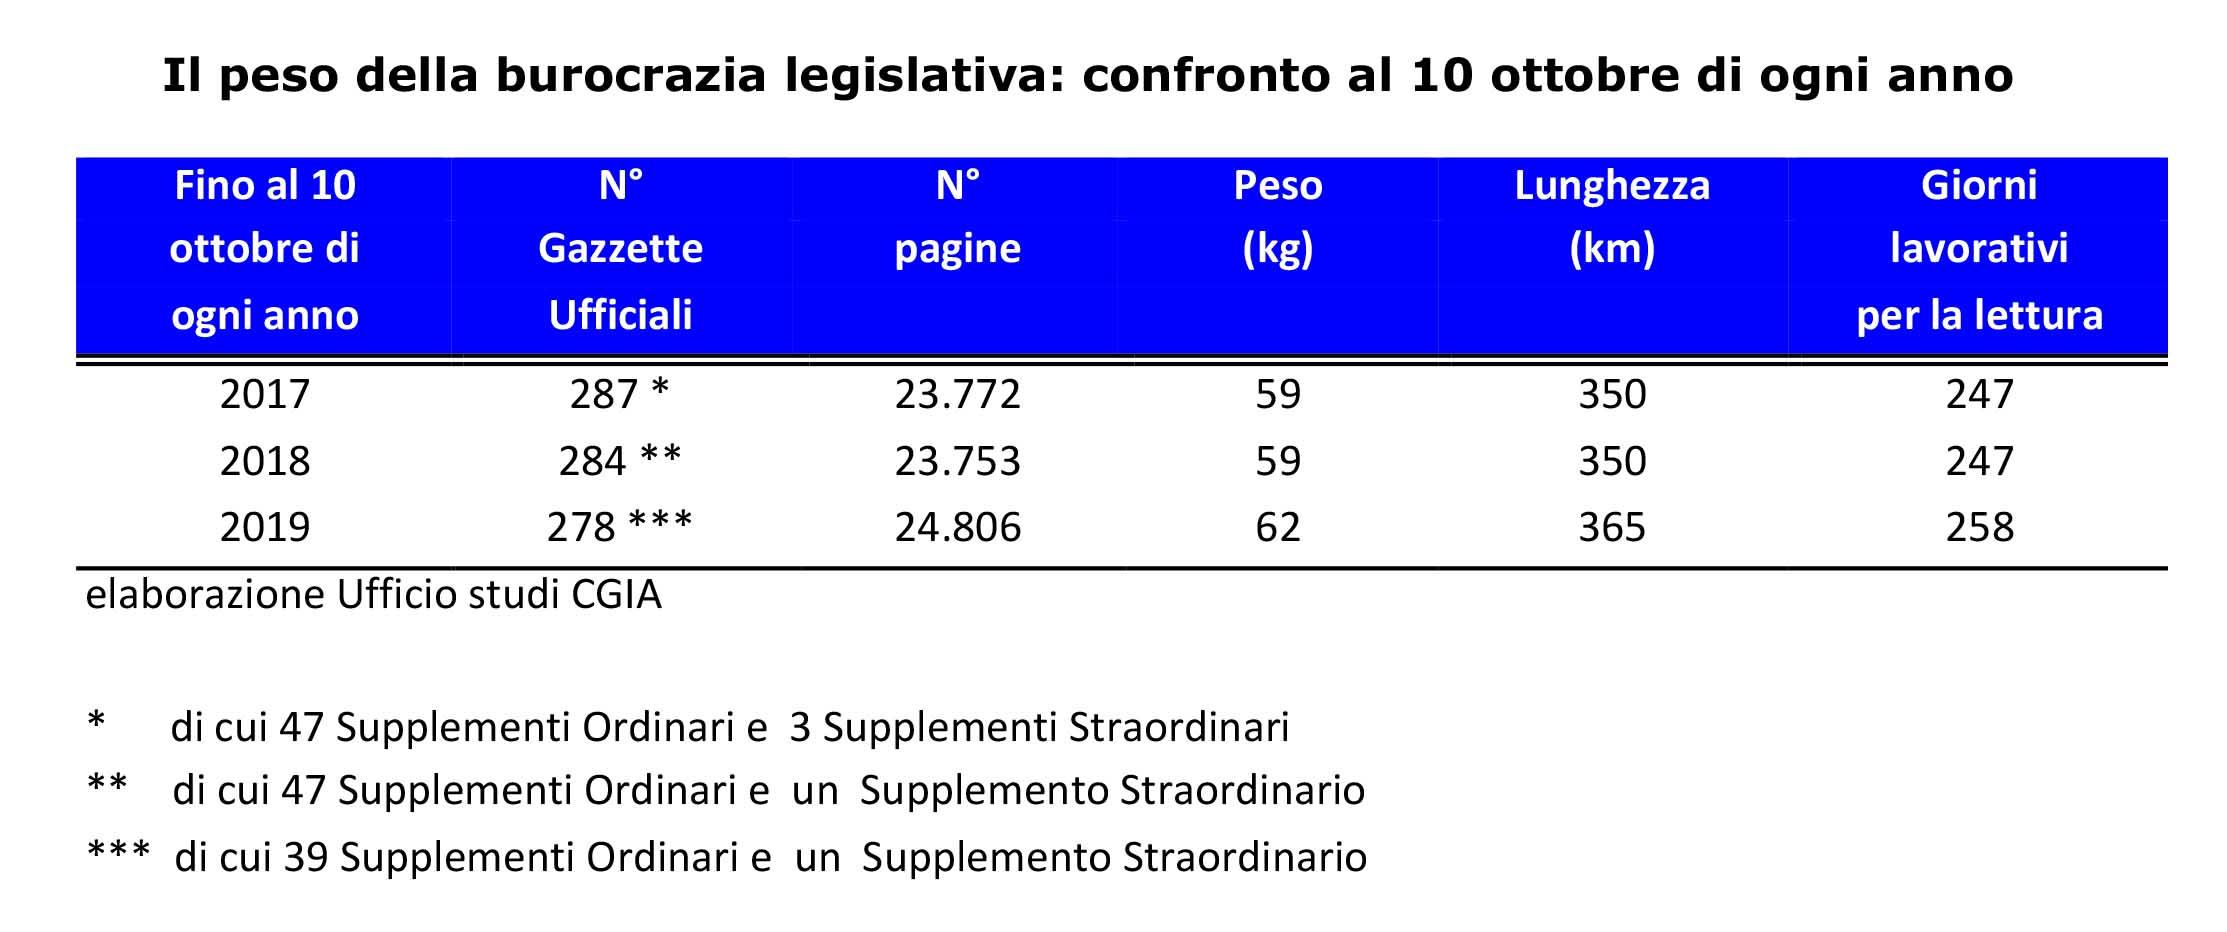 burocrazia legislativa